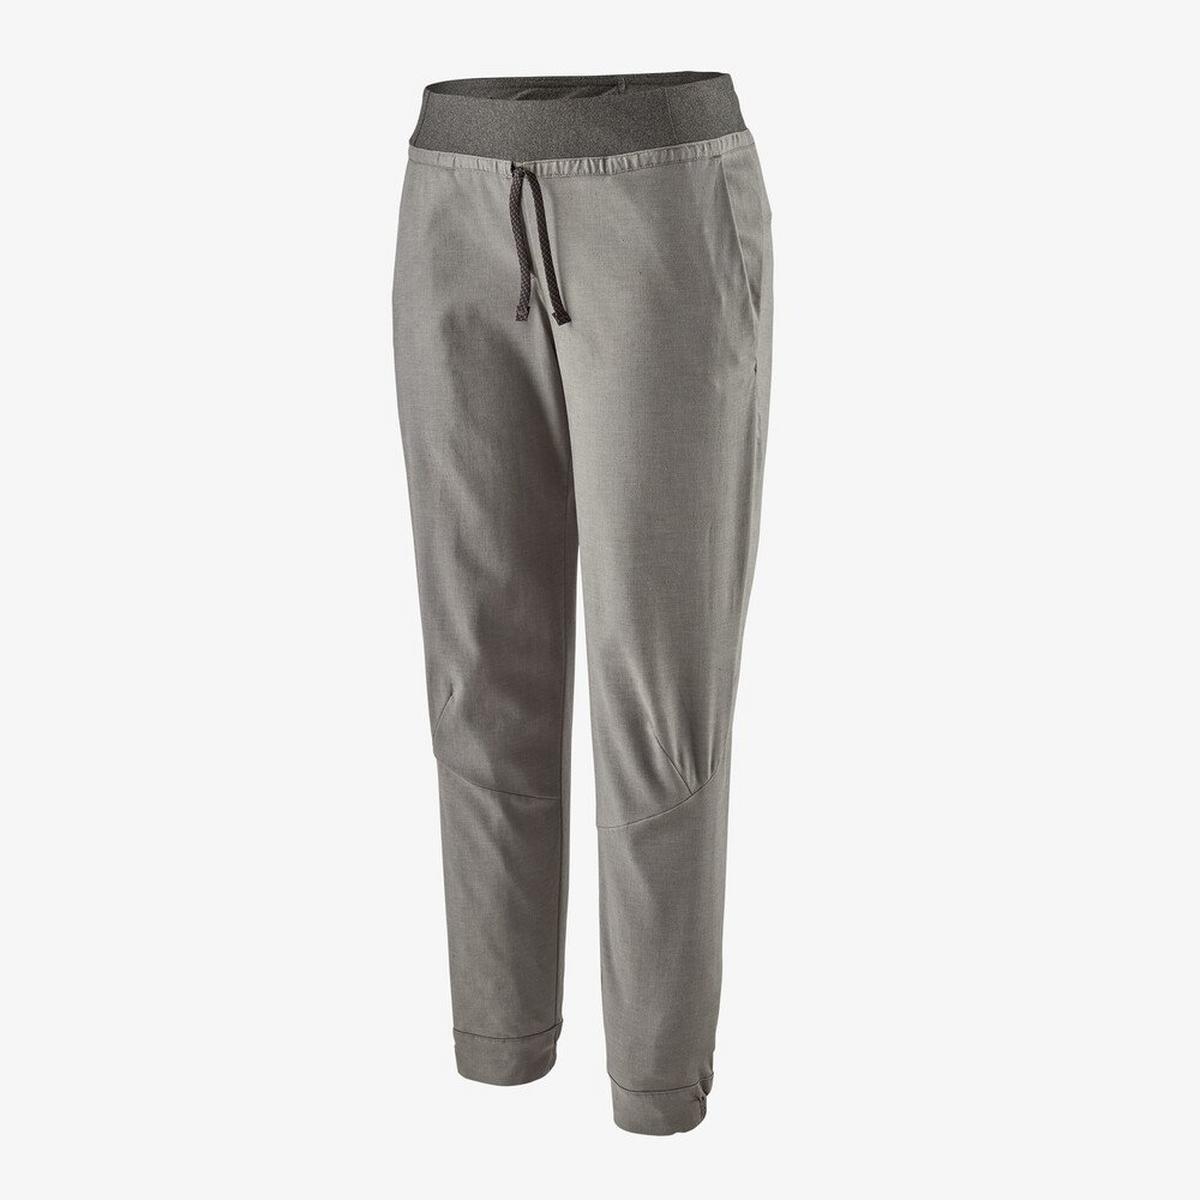 Patagonia Pants Women's Hampi Rock Pant Feather Grey